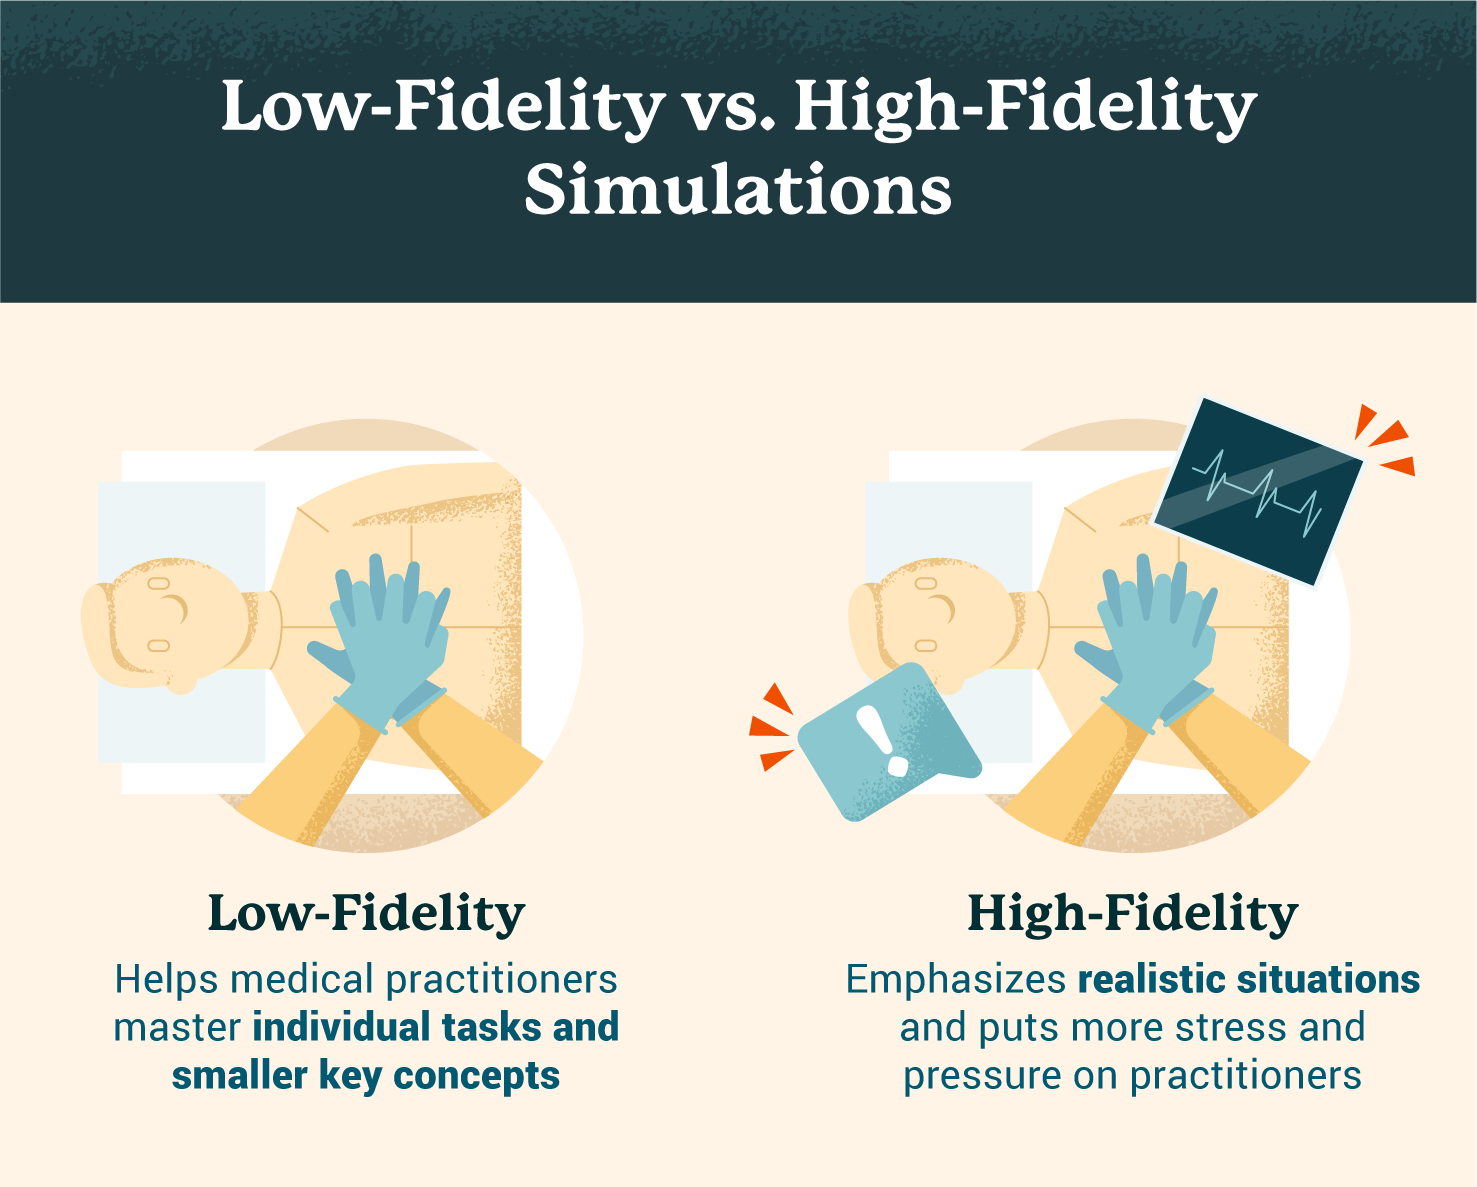 low fidelity vs high fidelity simulation based learning illustration